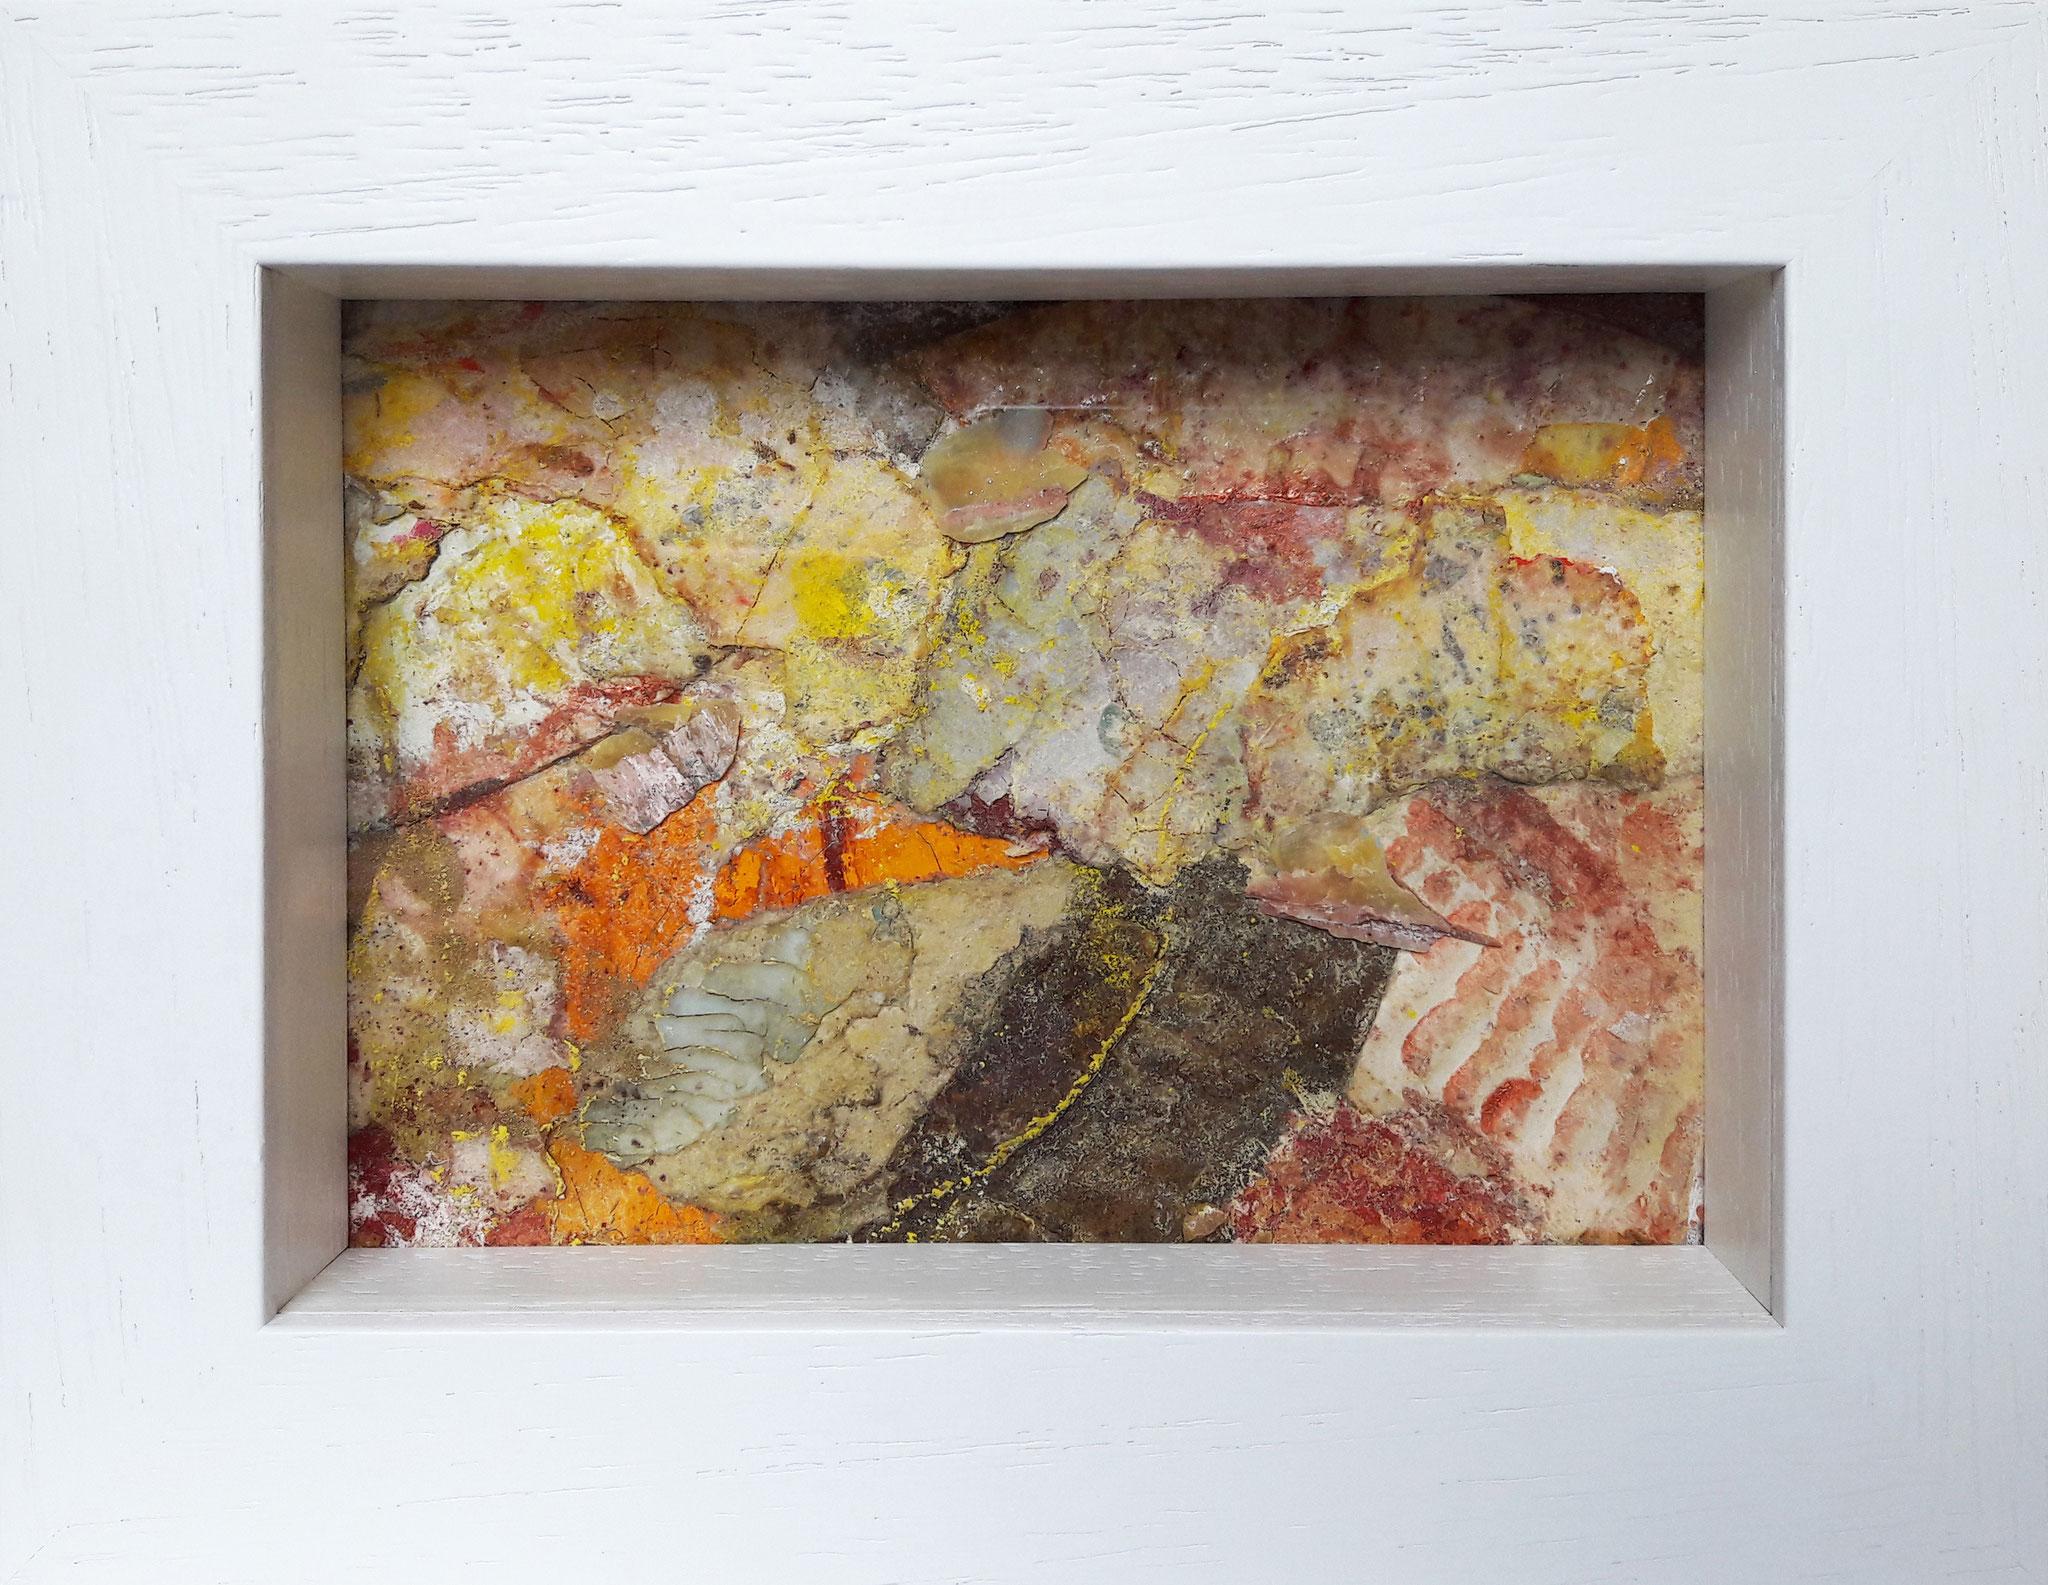 Papperlapapp 2, Acrylmischtechnik, 23 x 18 mit Rahmen, 2017,  verkauft